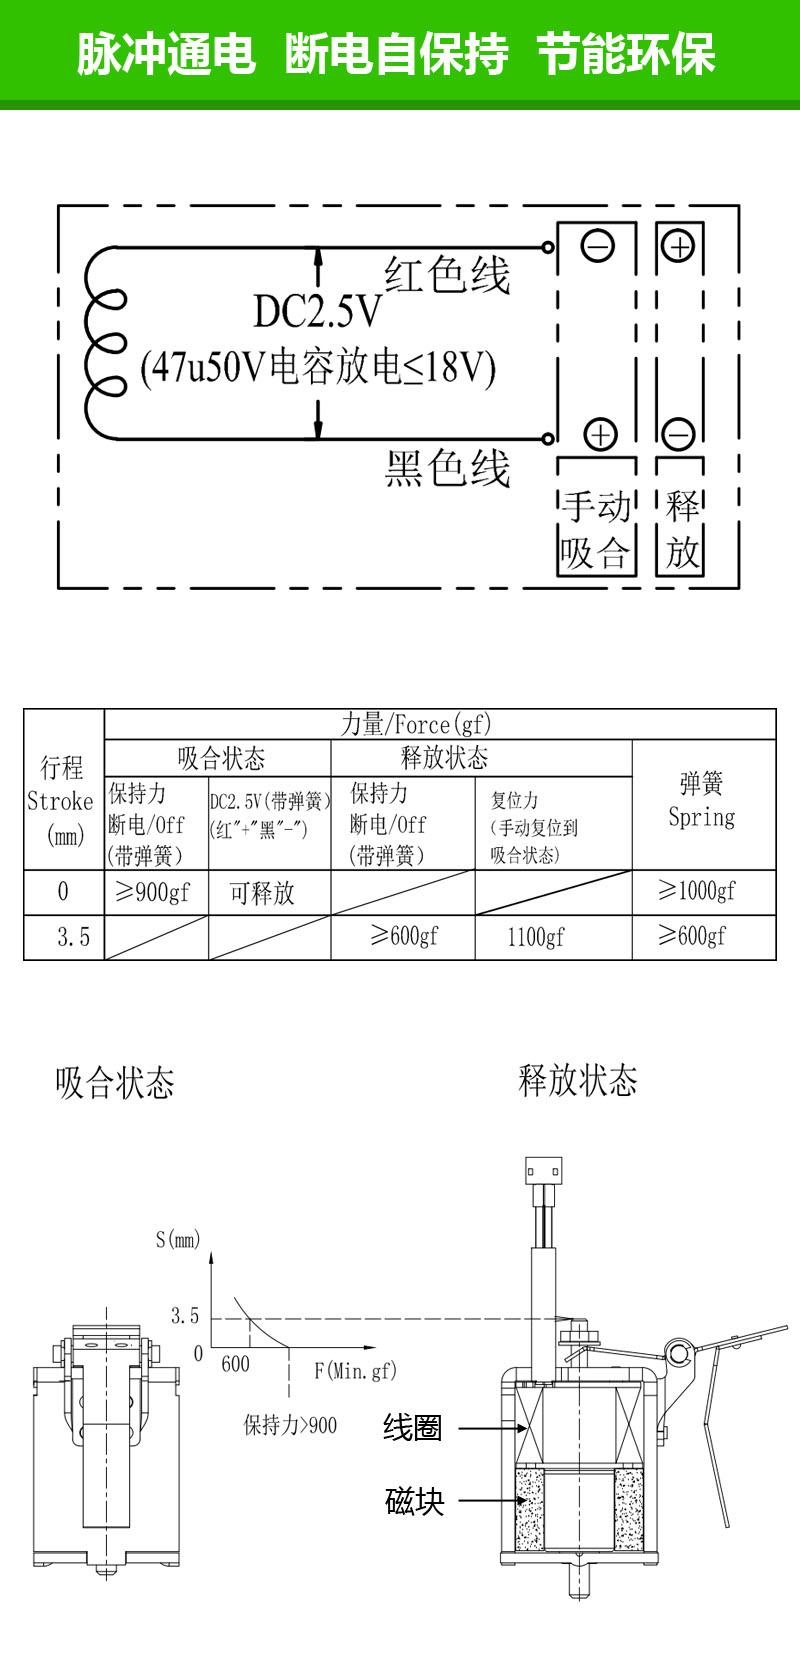 SDK-0930S单保持电磁铁 漏电保护开关安全电子锁自保持式电磁铁螺线管